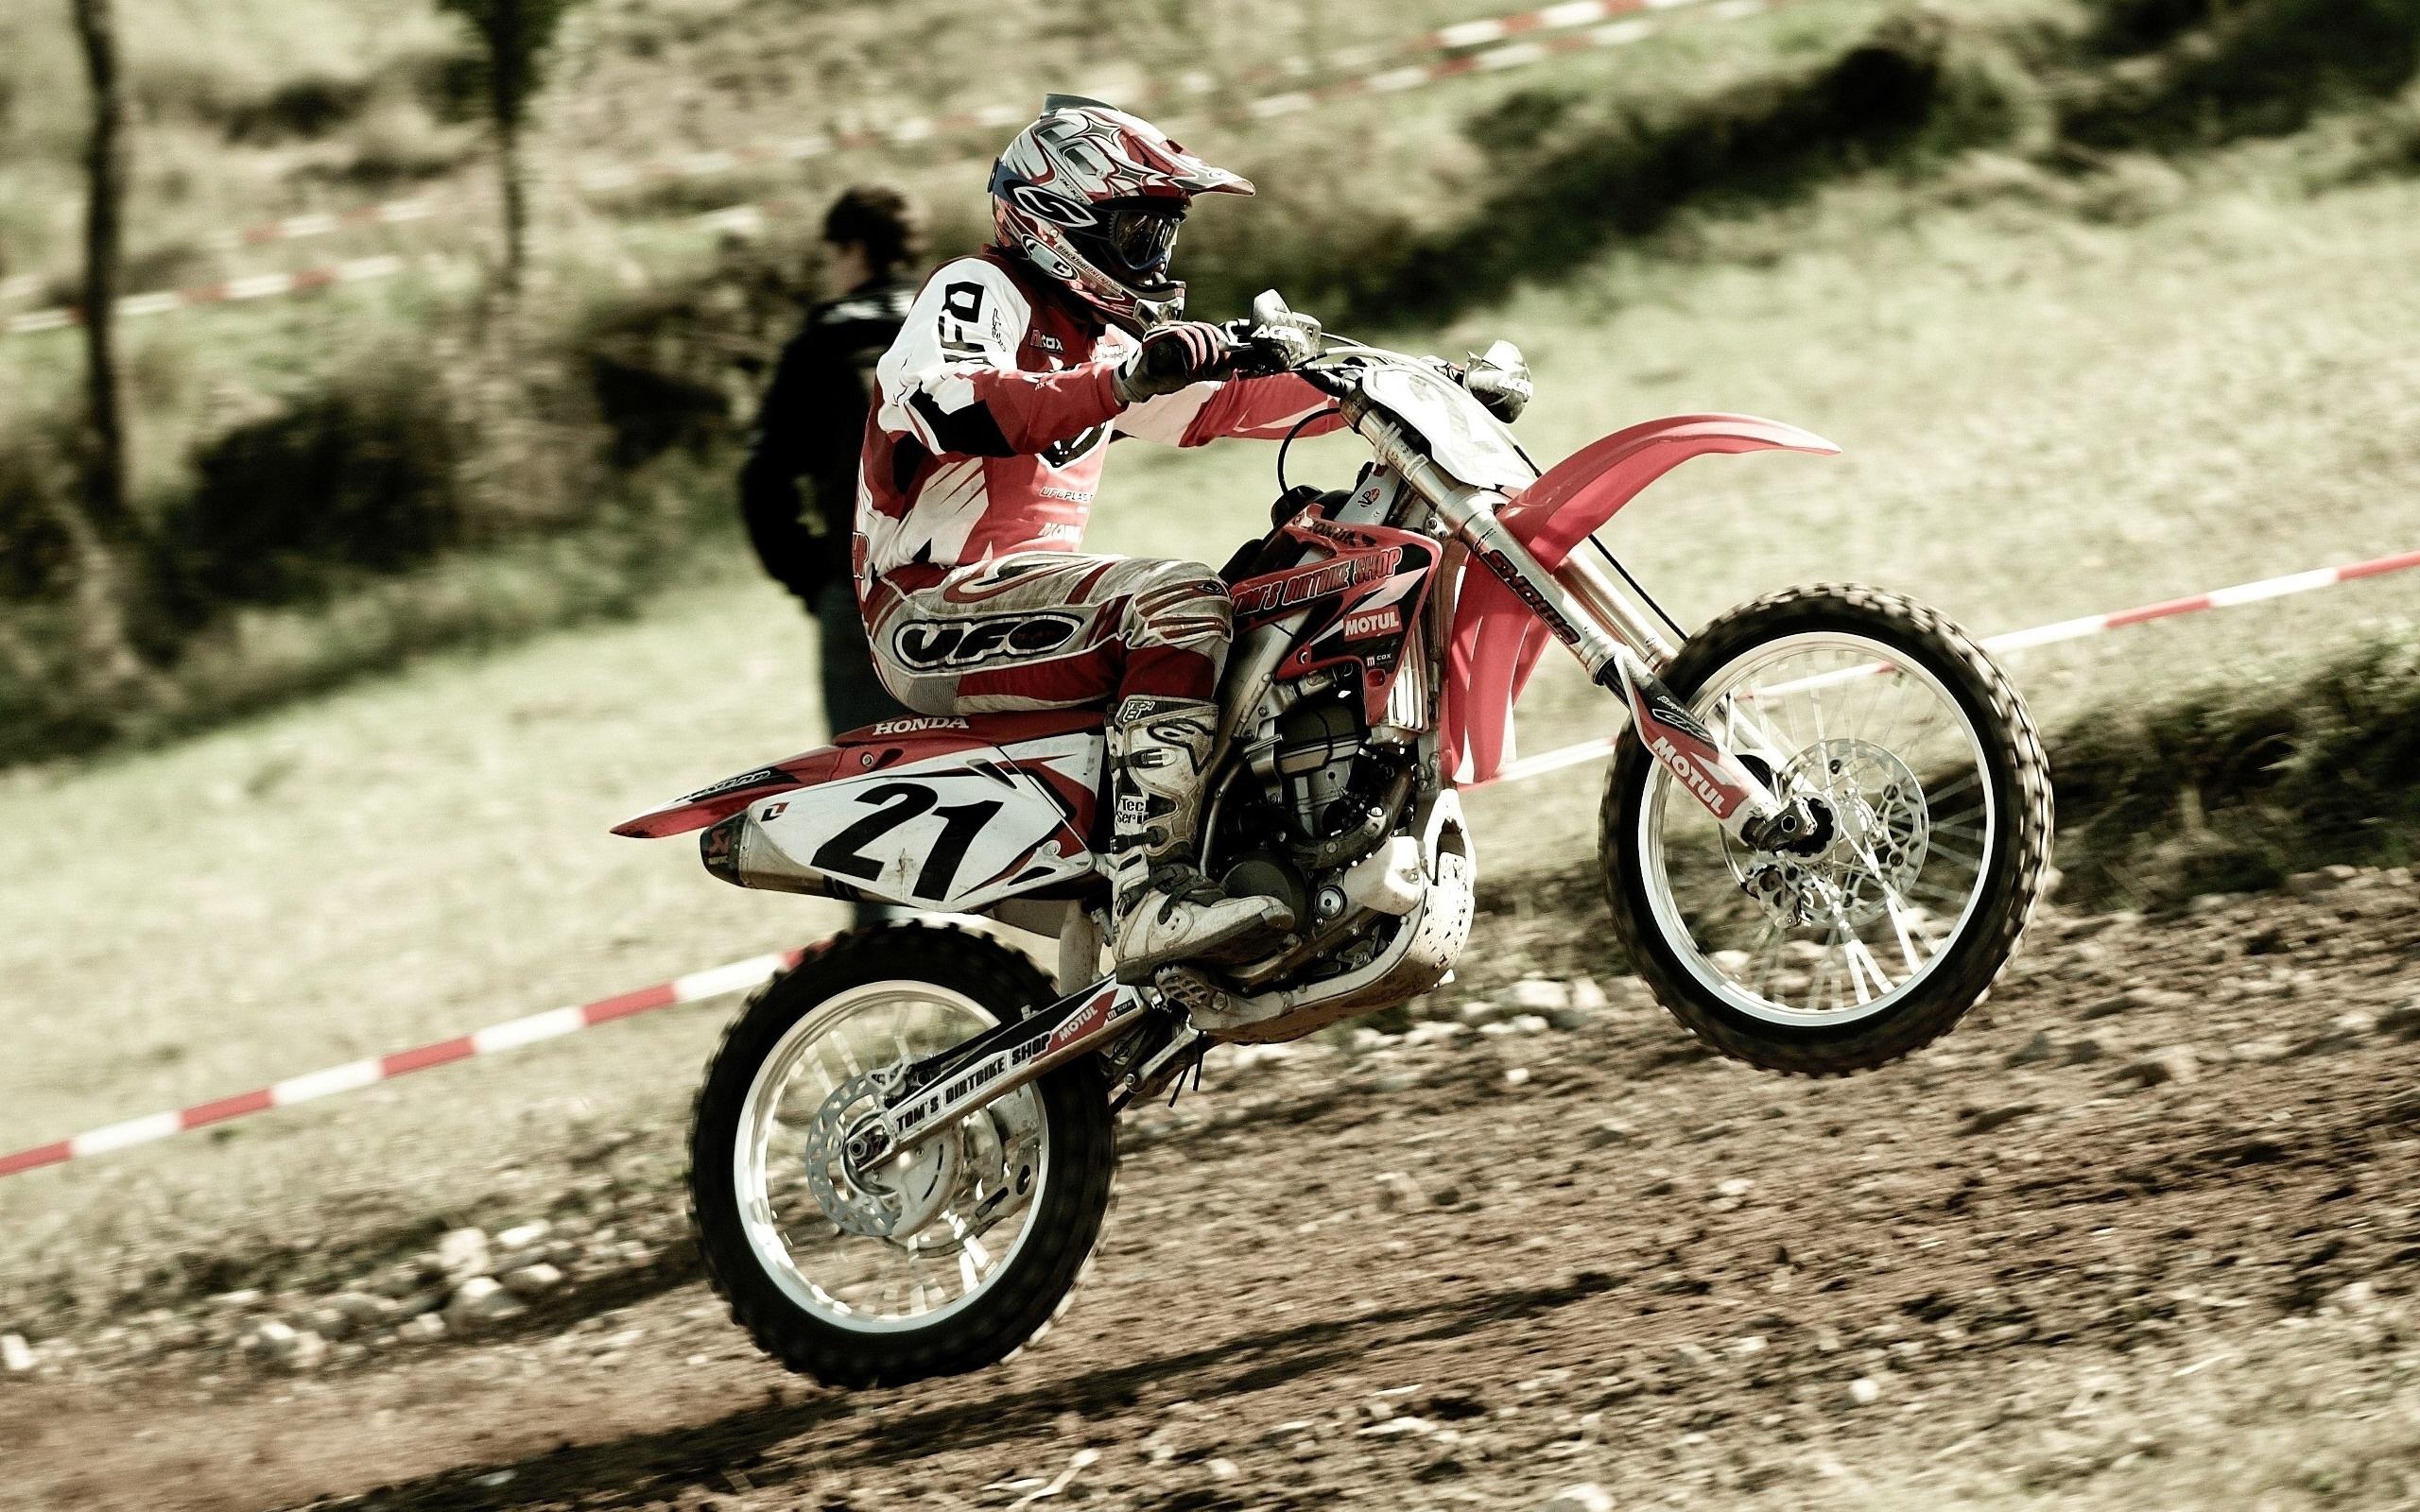 Motocross Wallpaper 2560x1600